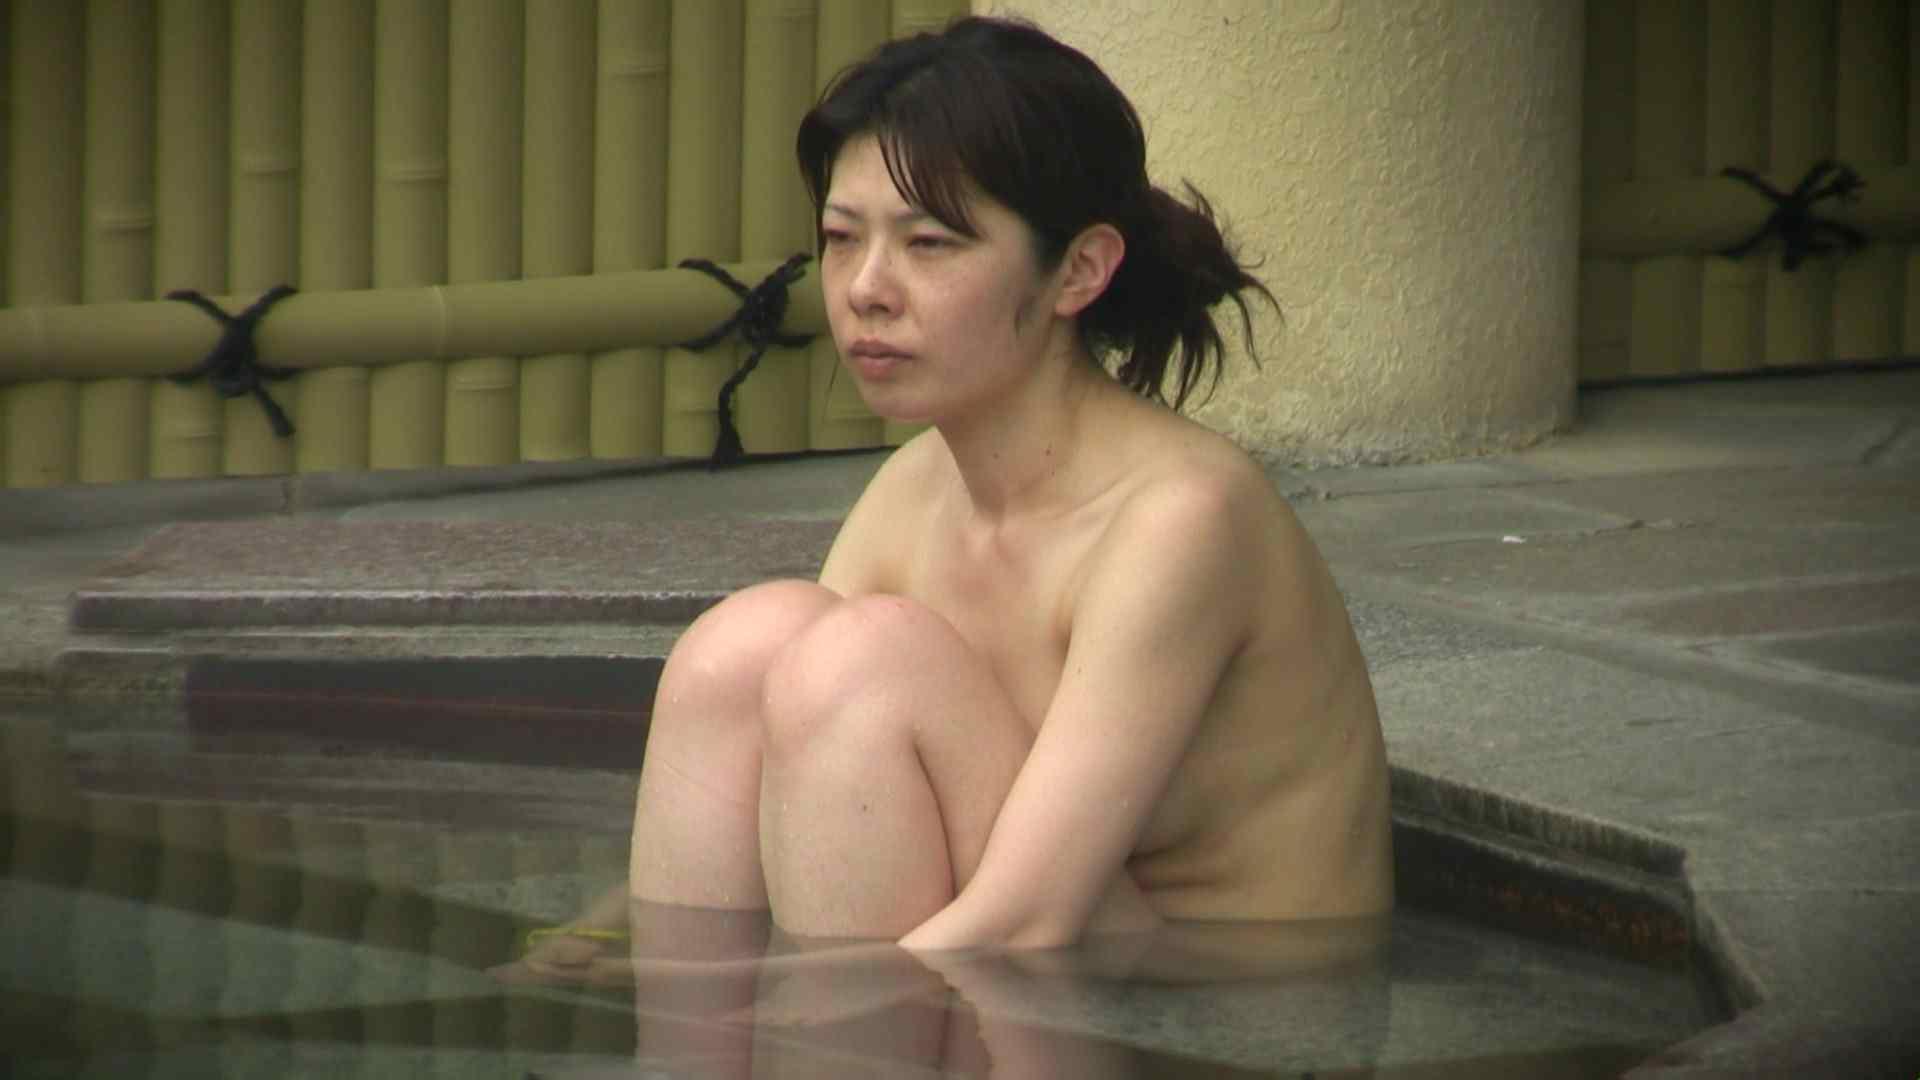 Aquaな露天風呂Vol.676 盗撮シリーズ | 露天風呂編  83PIX 37